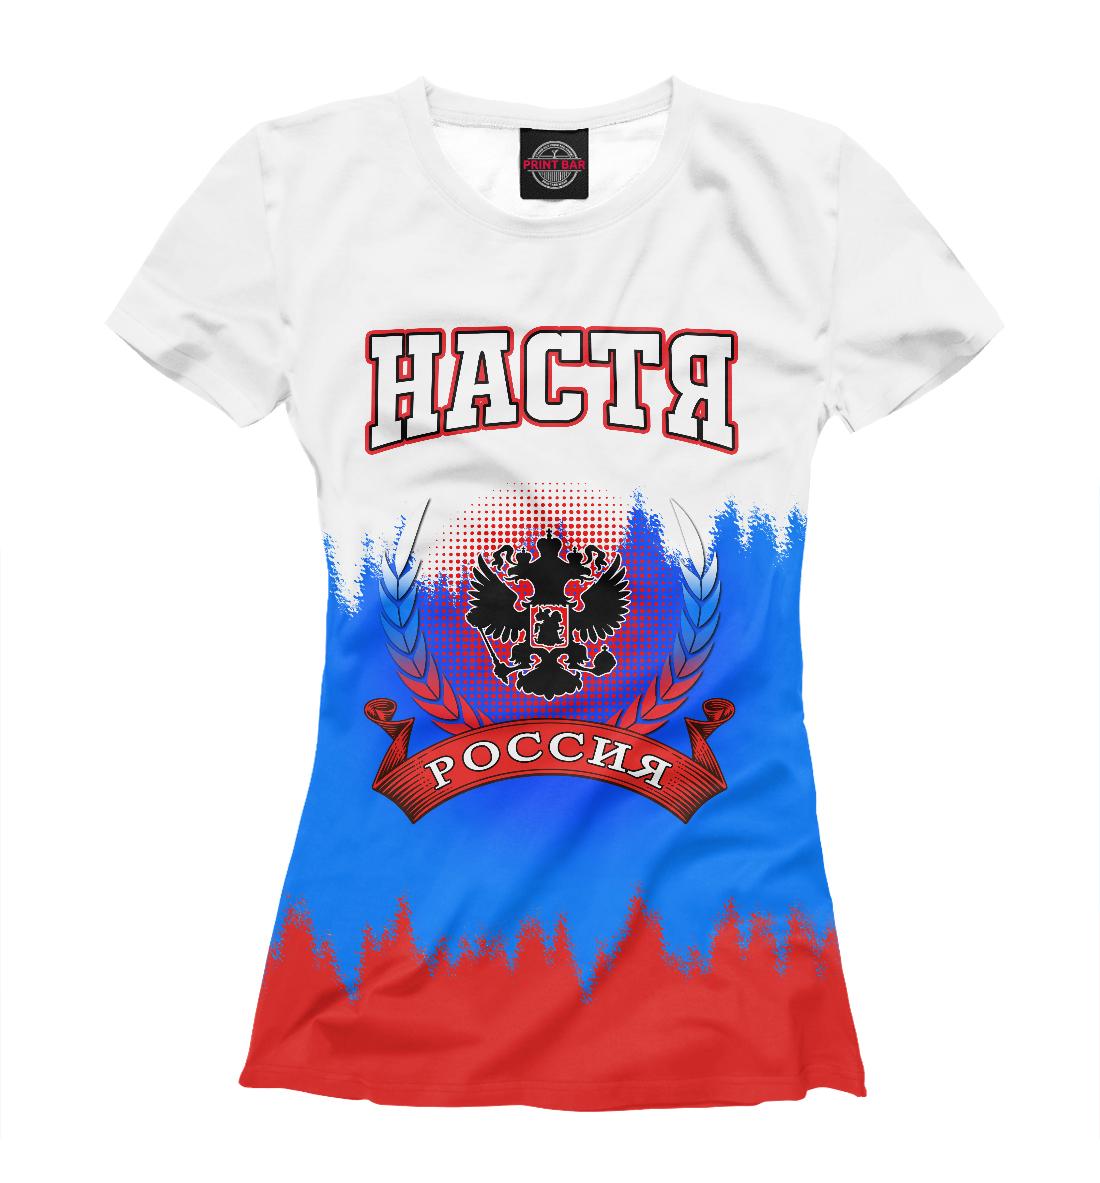 Купить Настя, Printbar, Футболки, ANS-937740-fut-1